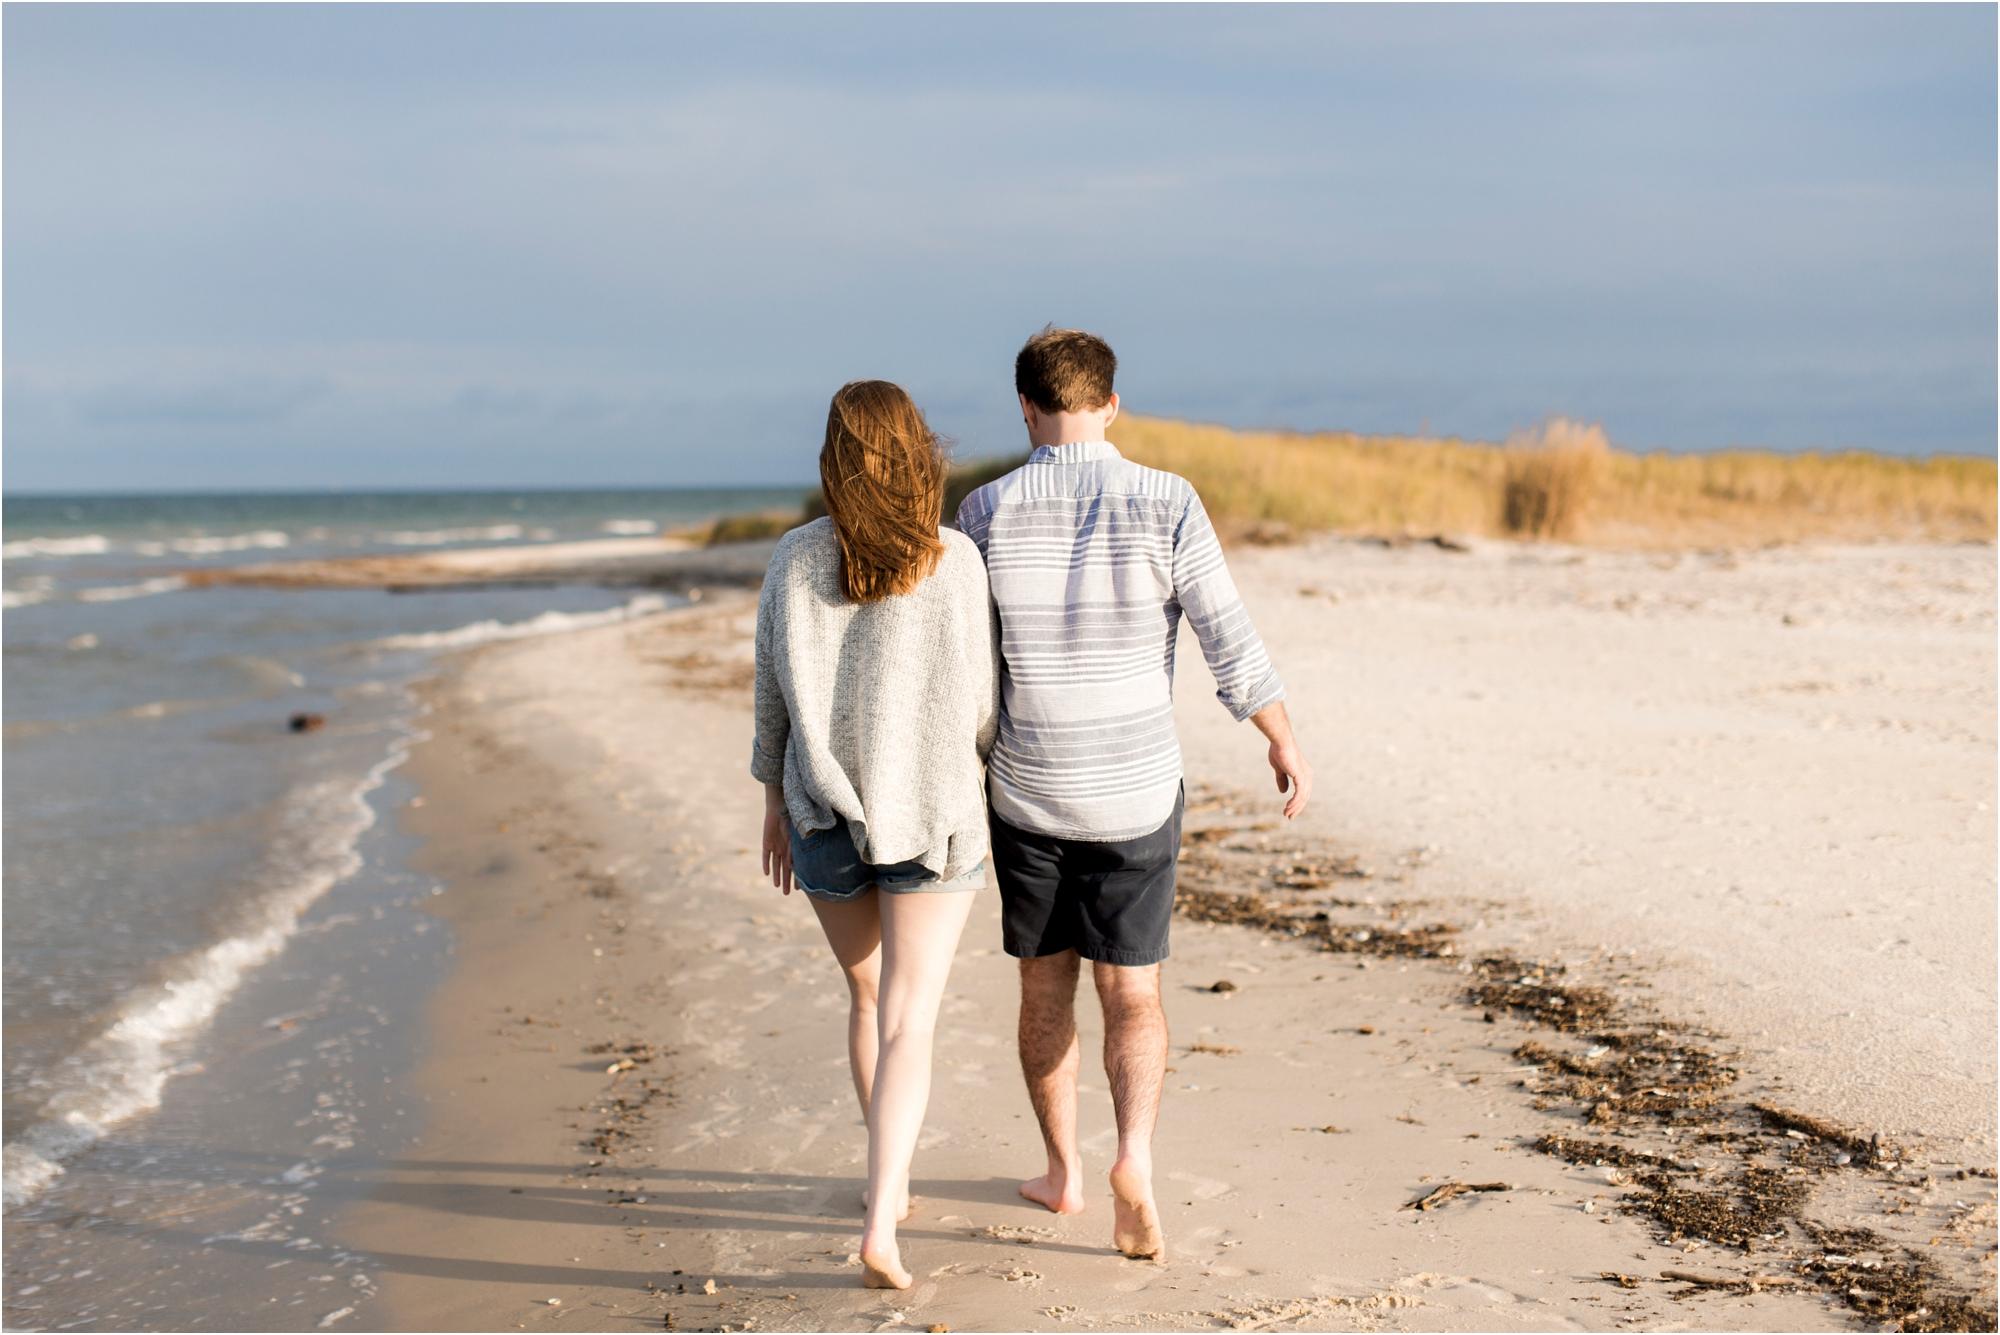 emily-drew-chesapeake-bay-beach-virginia-engagement-photos_0003.jpg